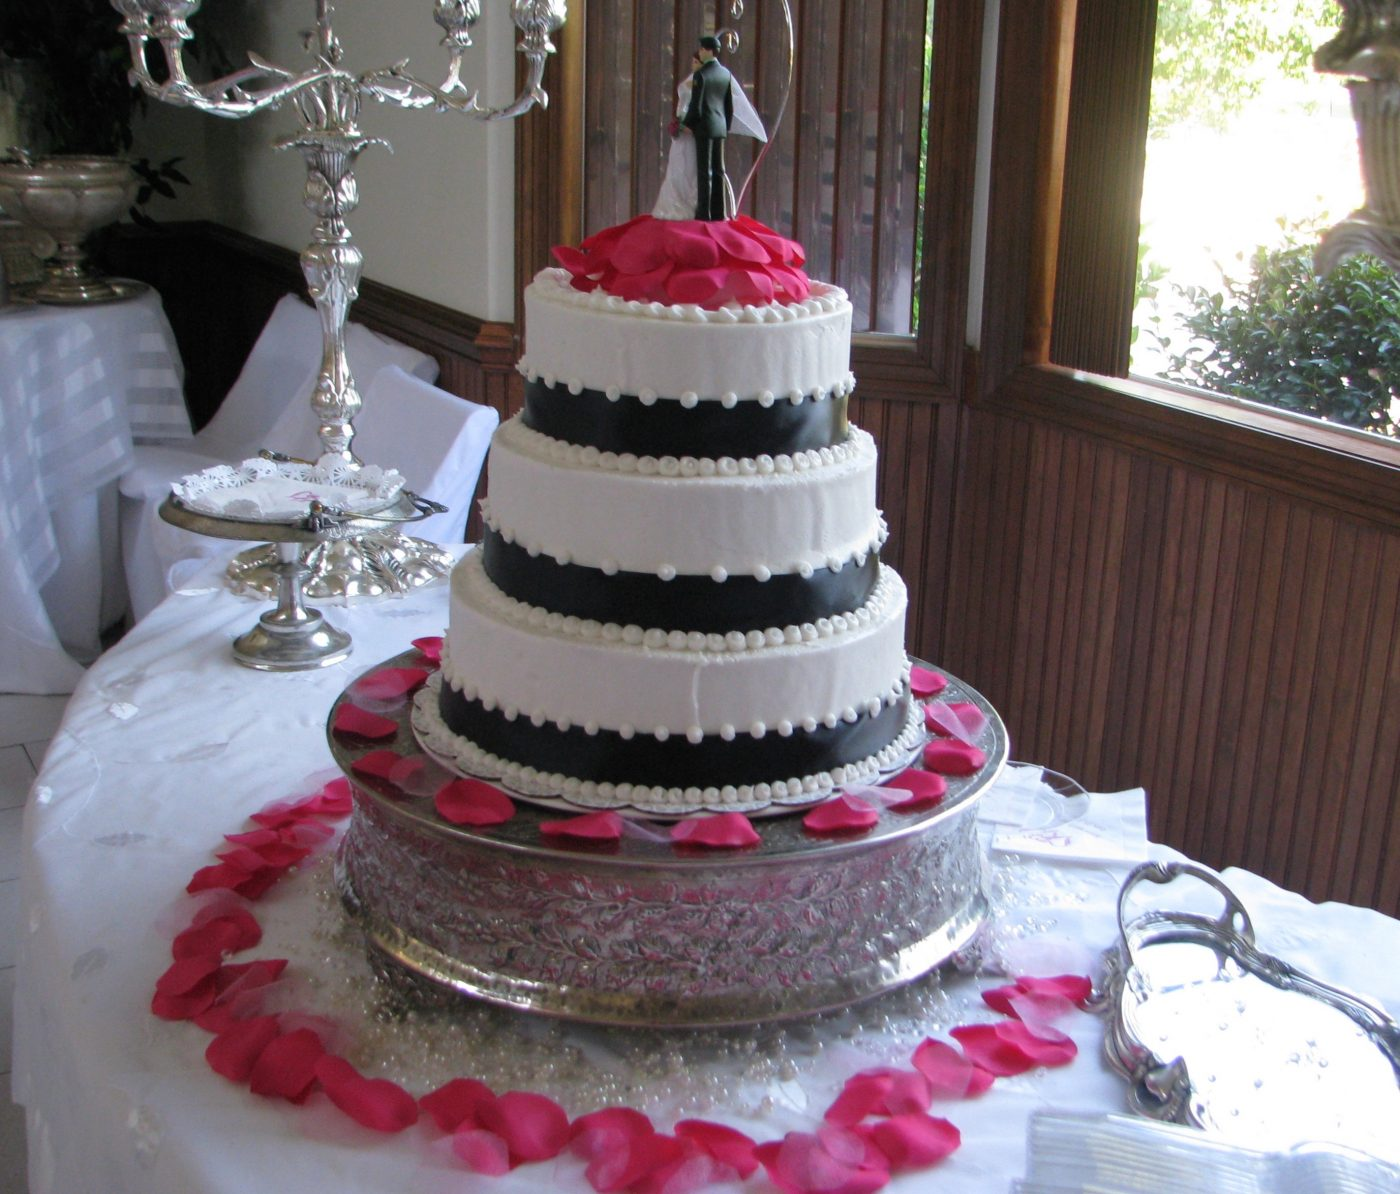 Classy Bride's Cake